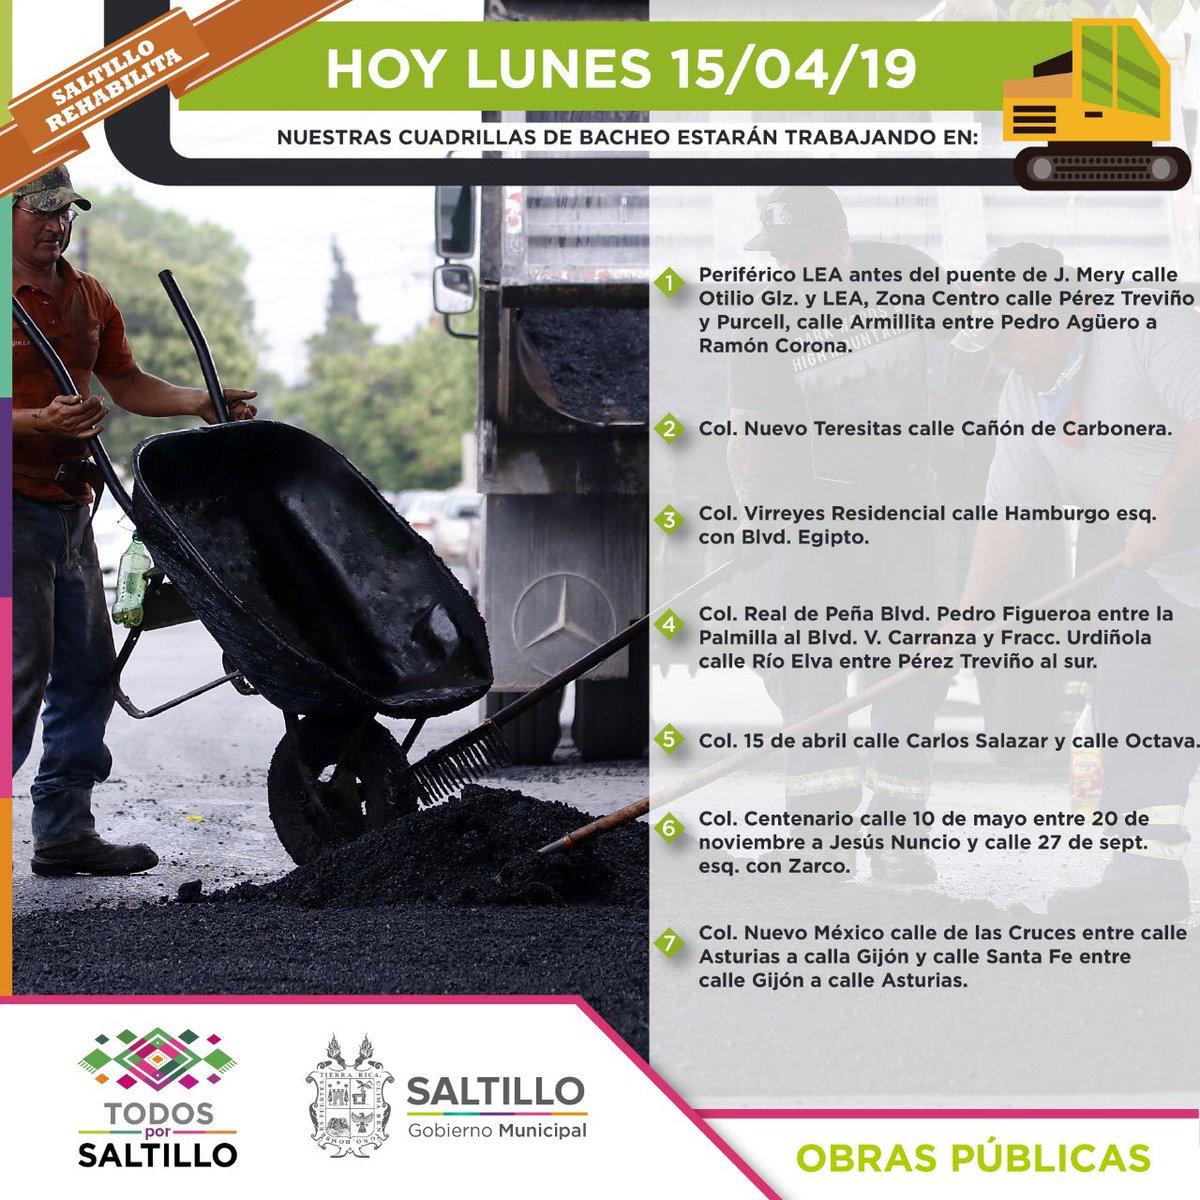 Obras Publicas Salt's photo on #FelizLunes